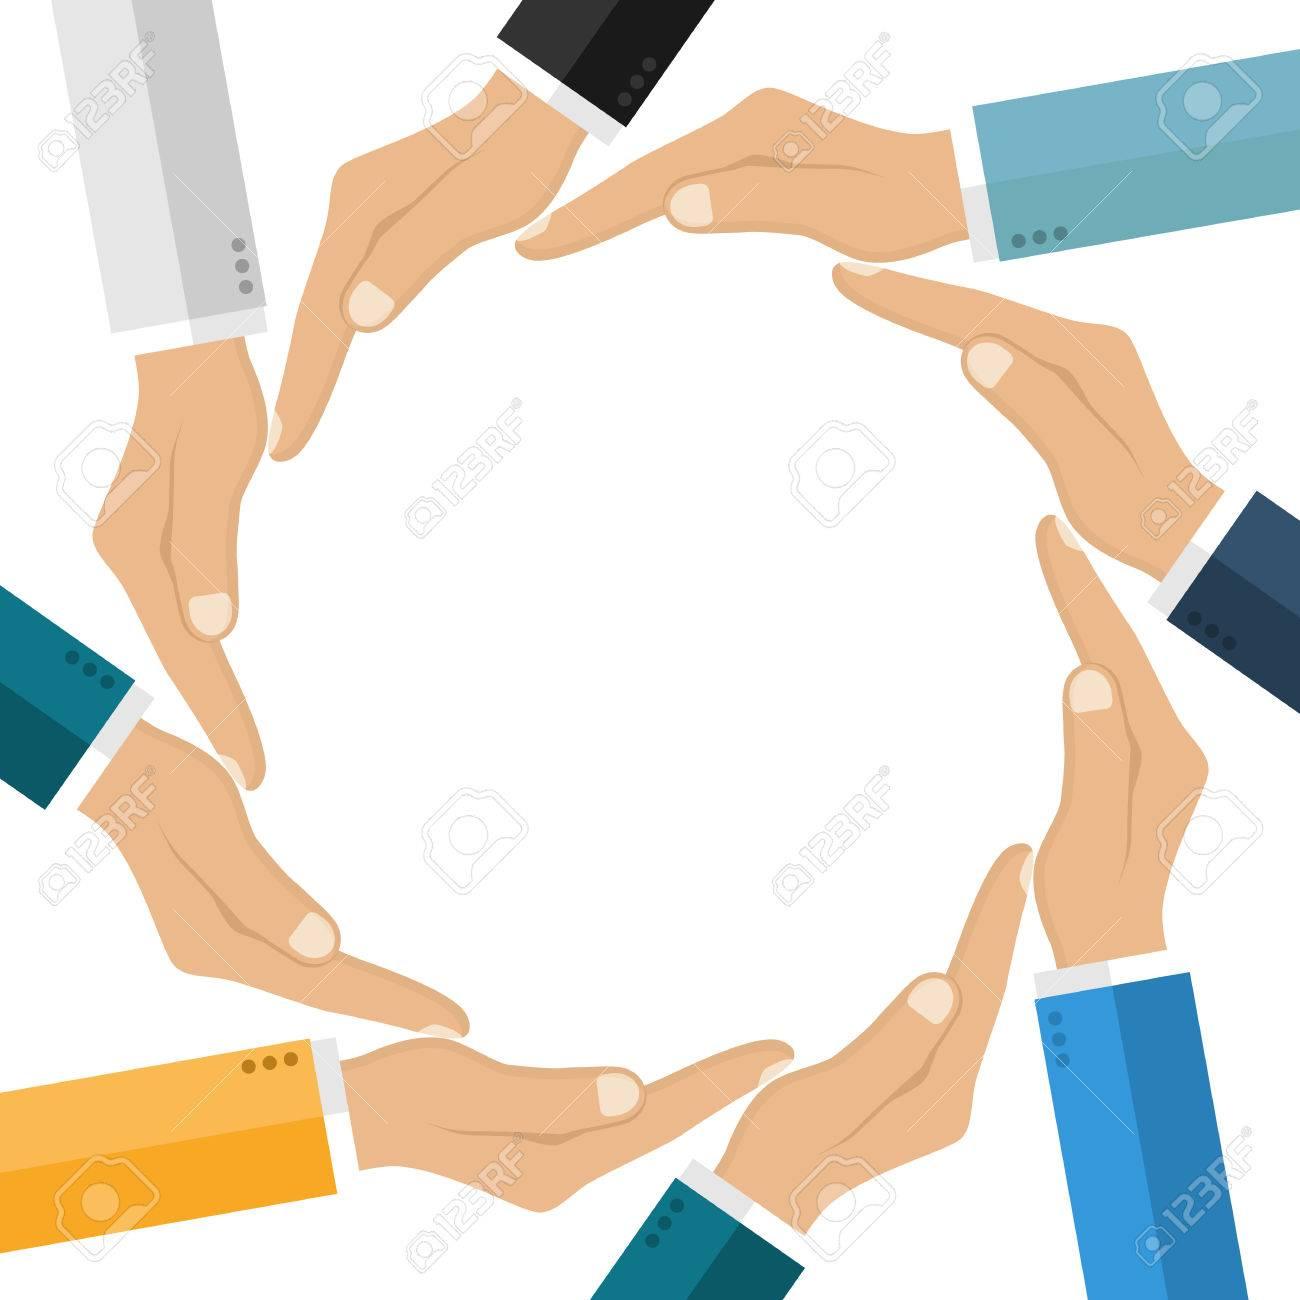 Human hands making circle symbol unification friendship human hands making circle symbol unification friendship protection connecting people empty space biocorpaavc